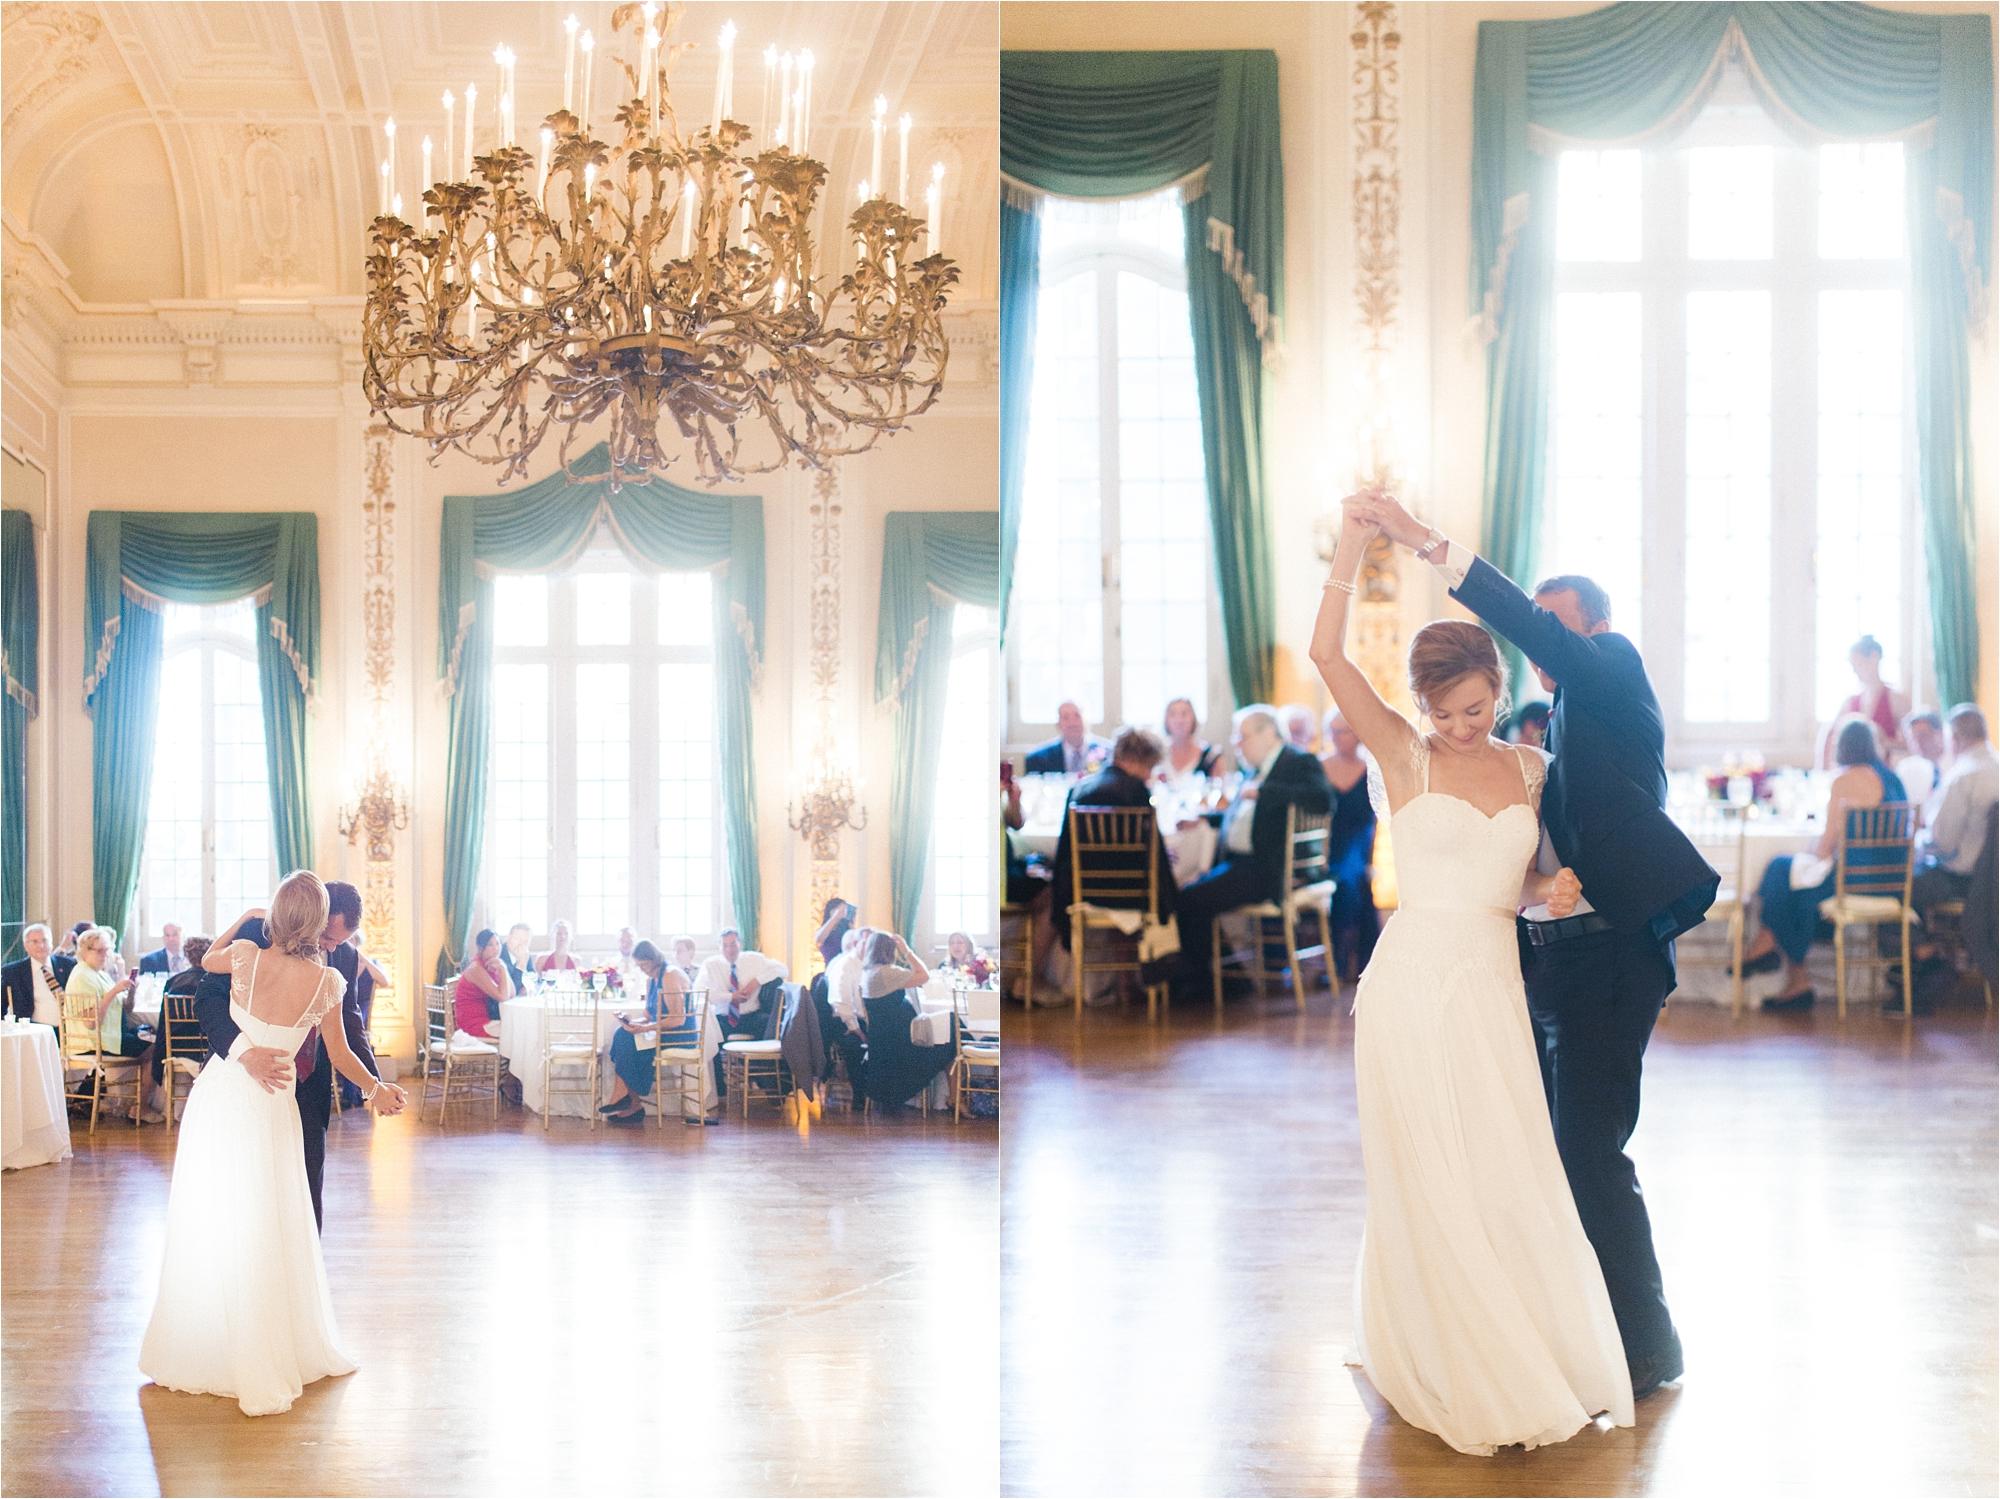 stephanie-yonce-photography-elegant-private-club-washington-dc-wedding-photos_0051.jpg